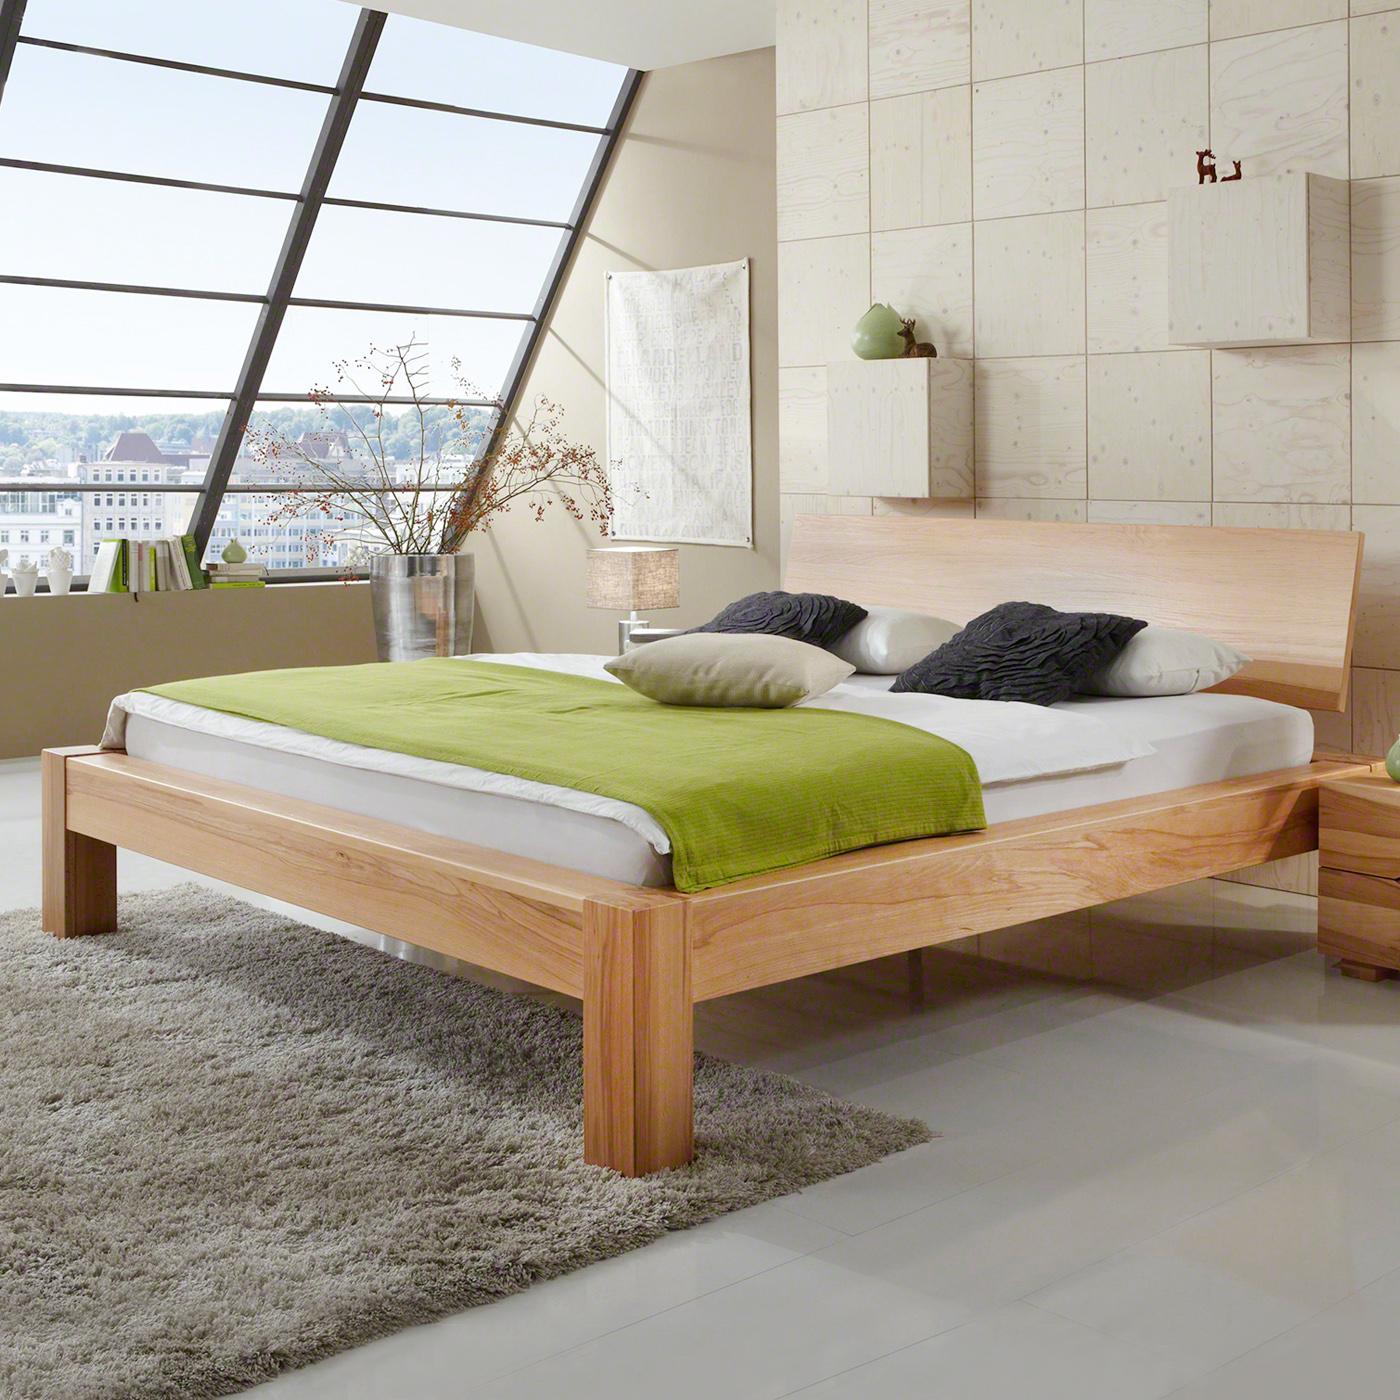 Massivholzbett Kernbuche geölt Holzbett Bettgestell Doppelbett Lonni – Bild 1